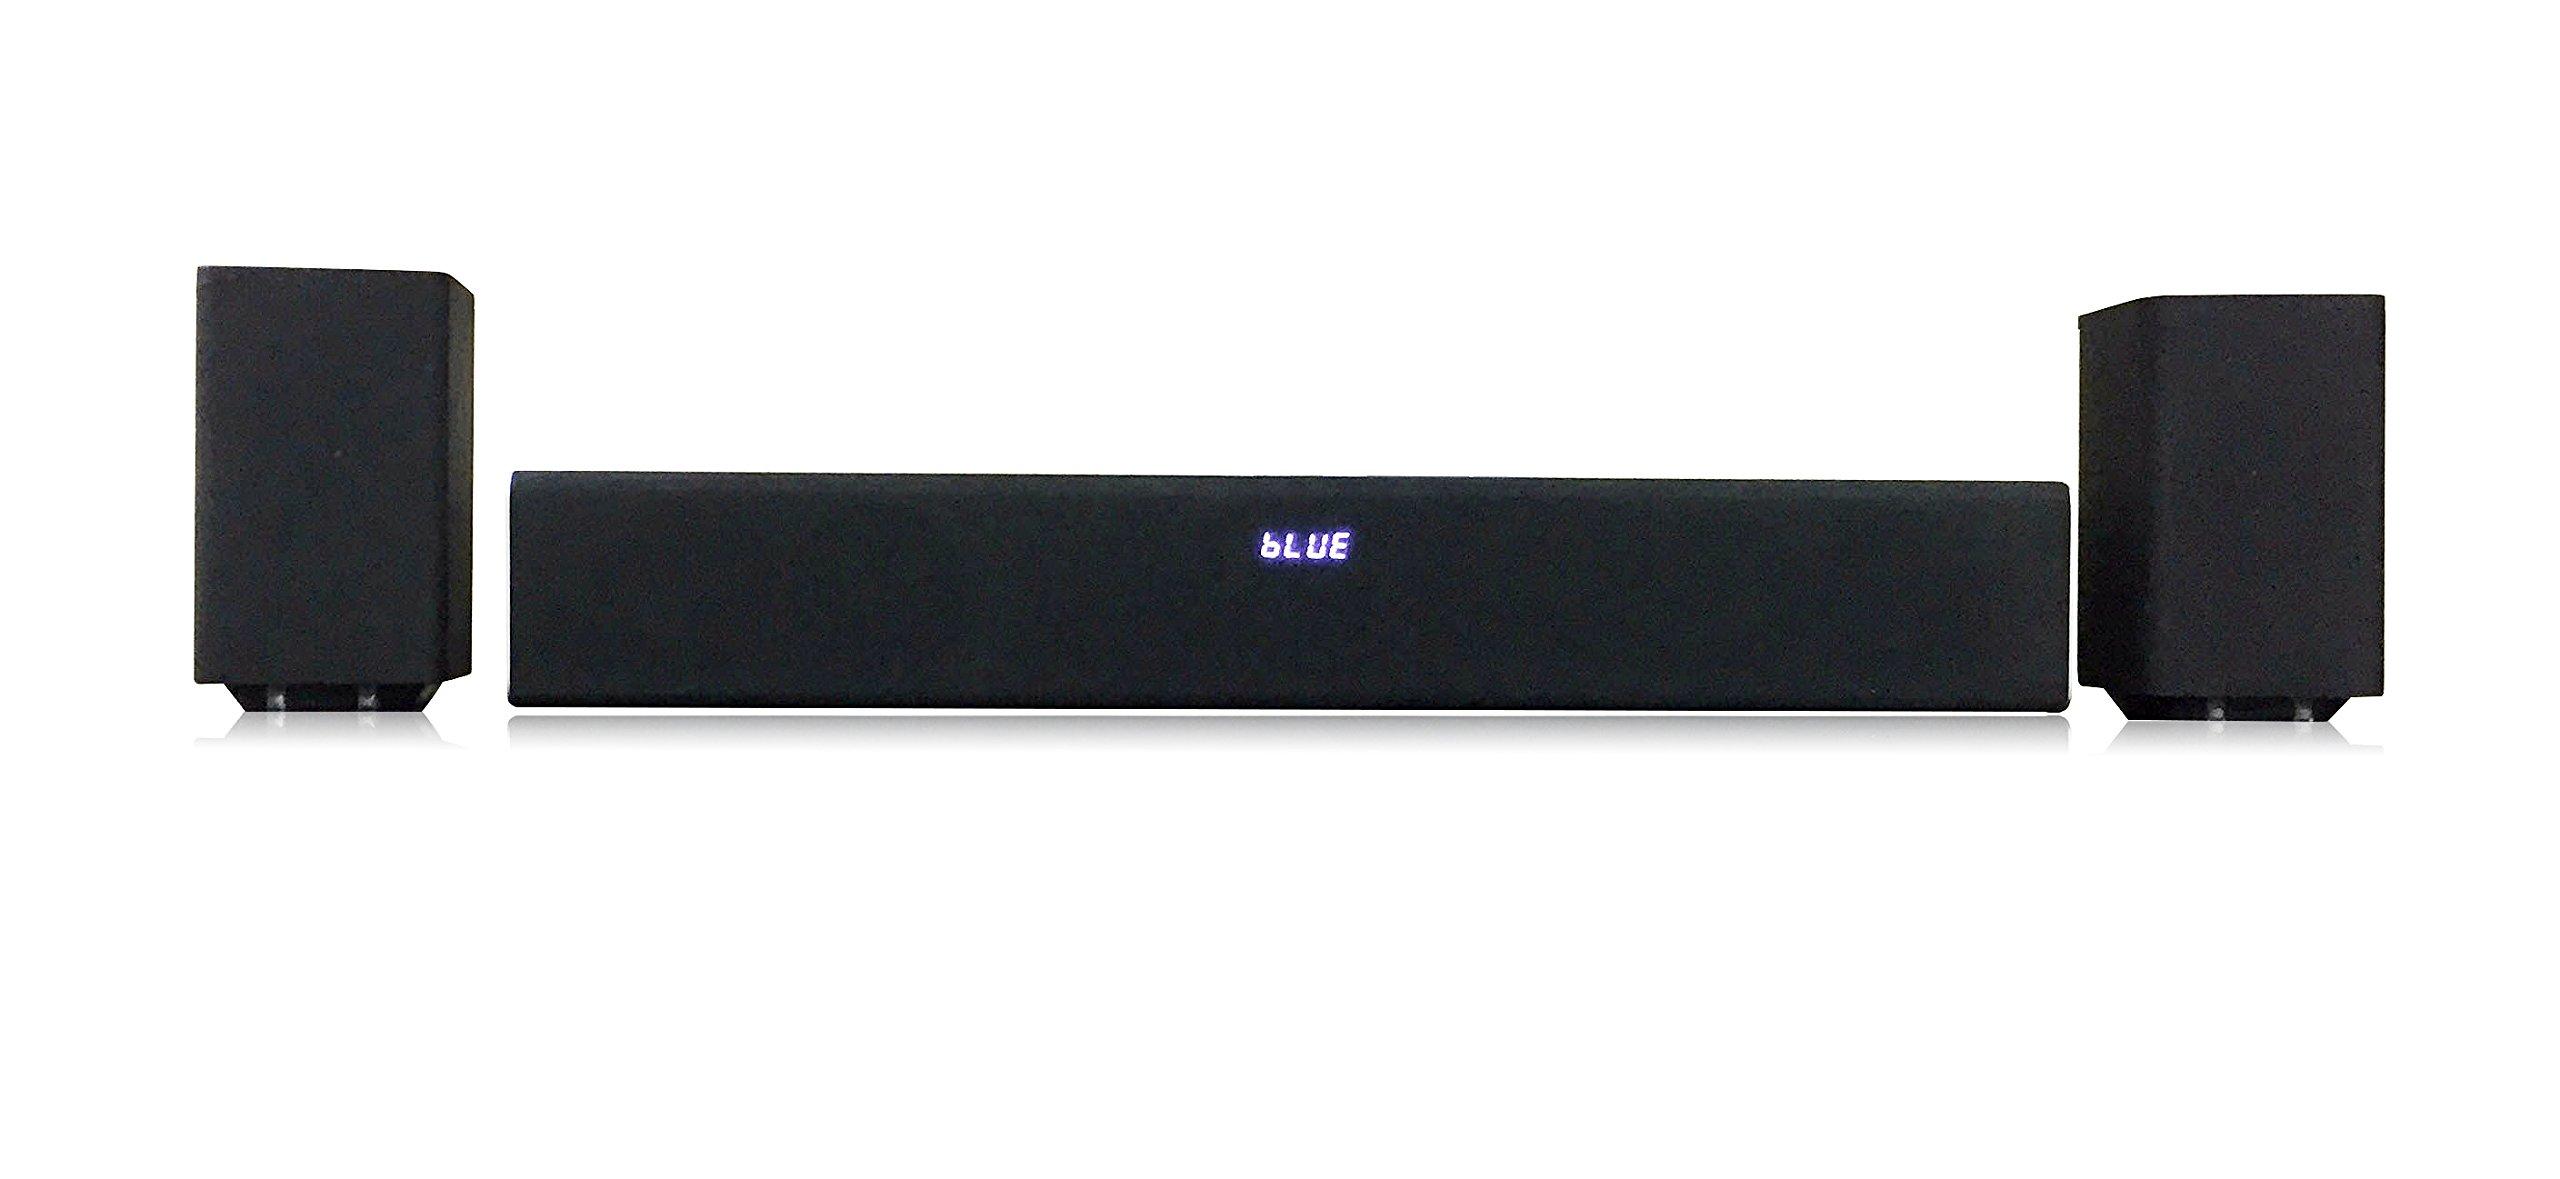 Proscan Detachable 2.1ch Bluetooth Soundbar with Subwoofer